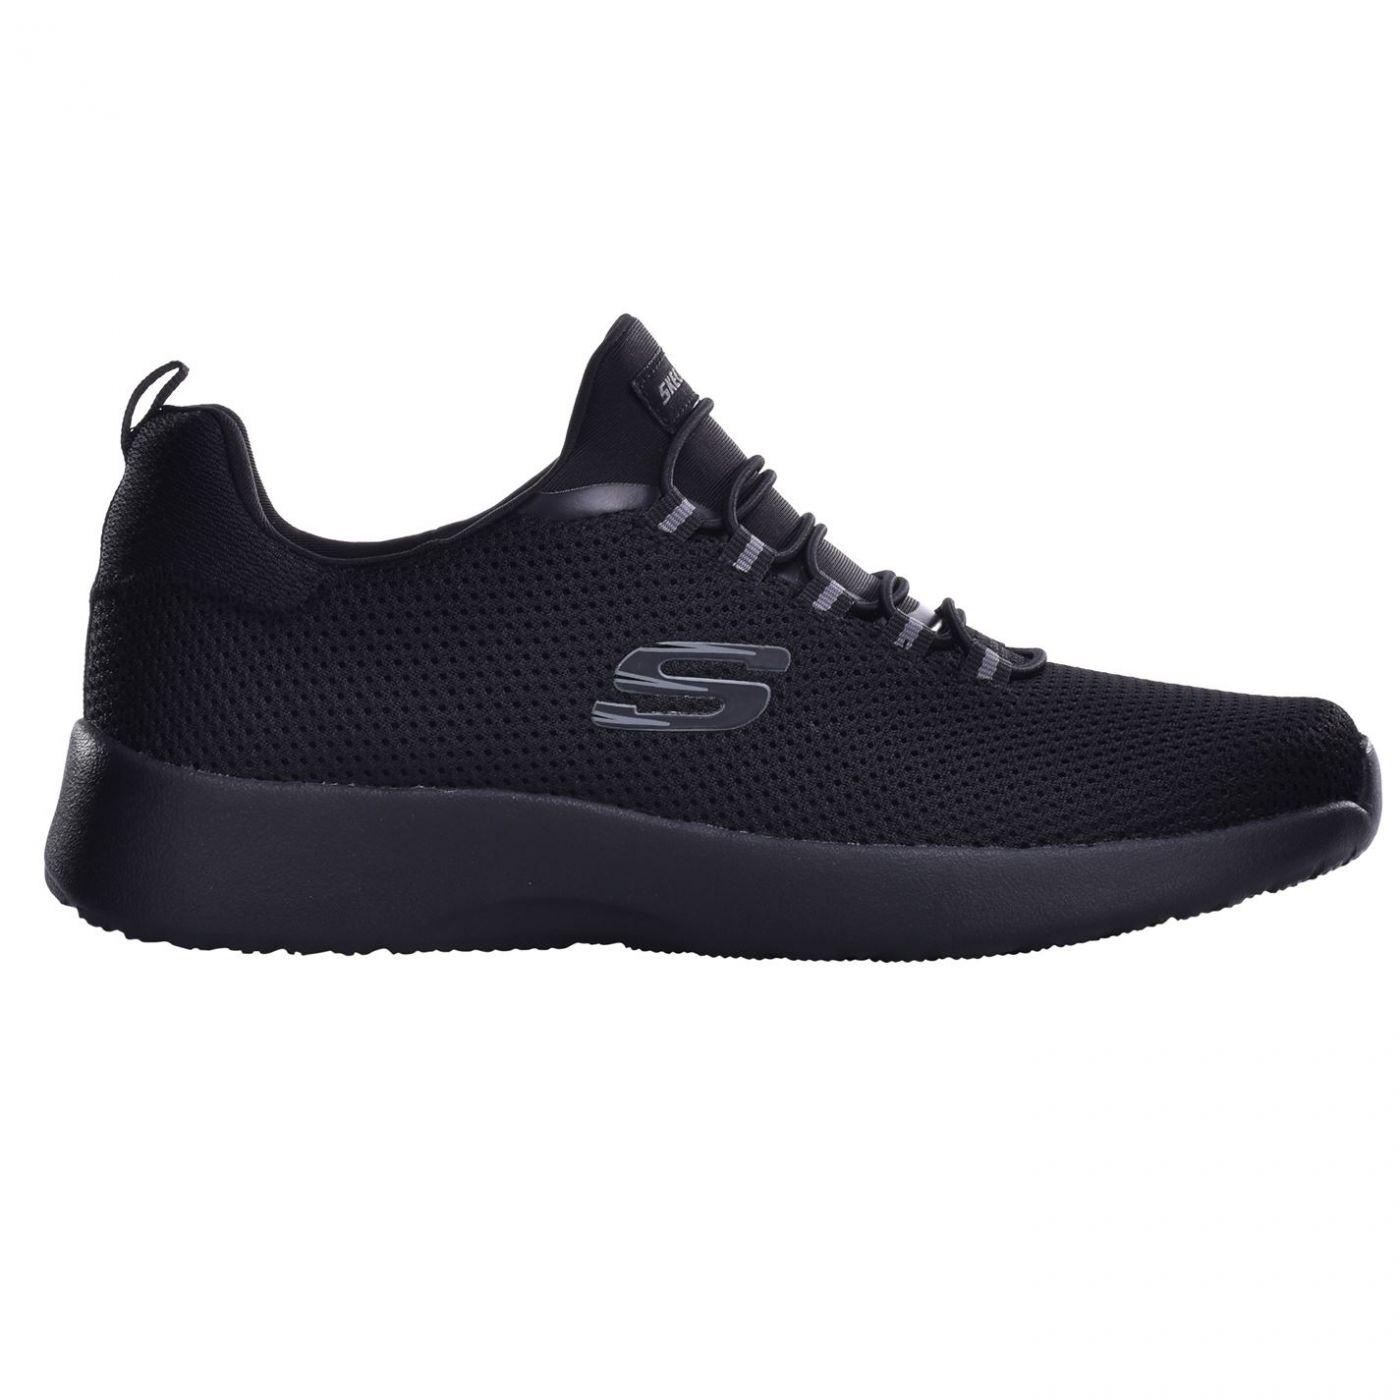 Skechers Dynamight Men's Shoes